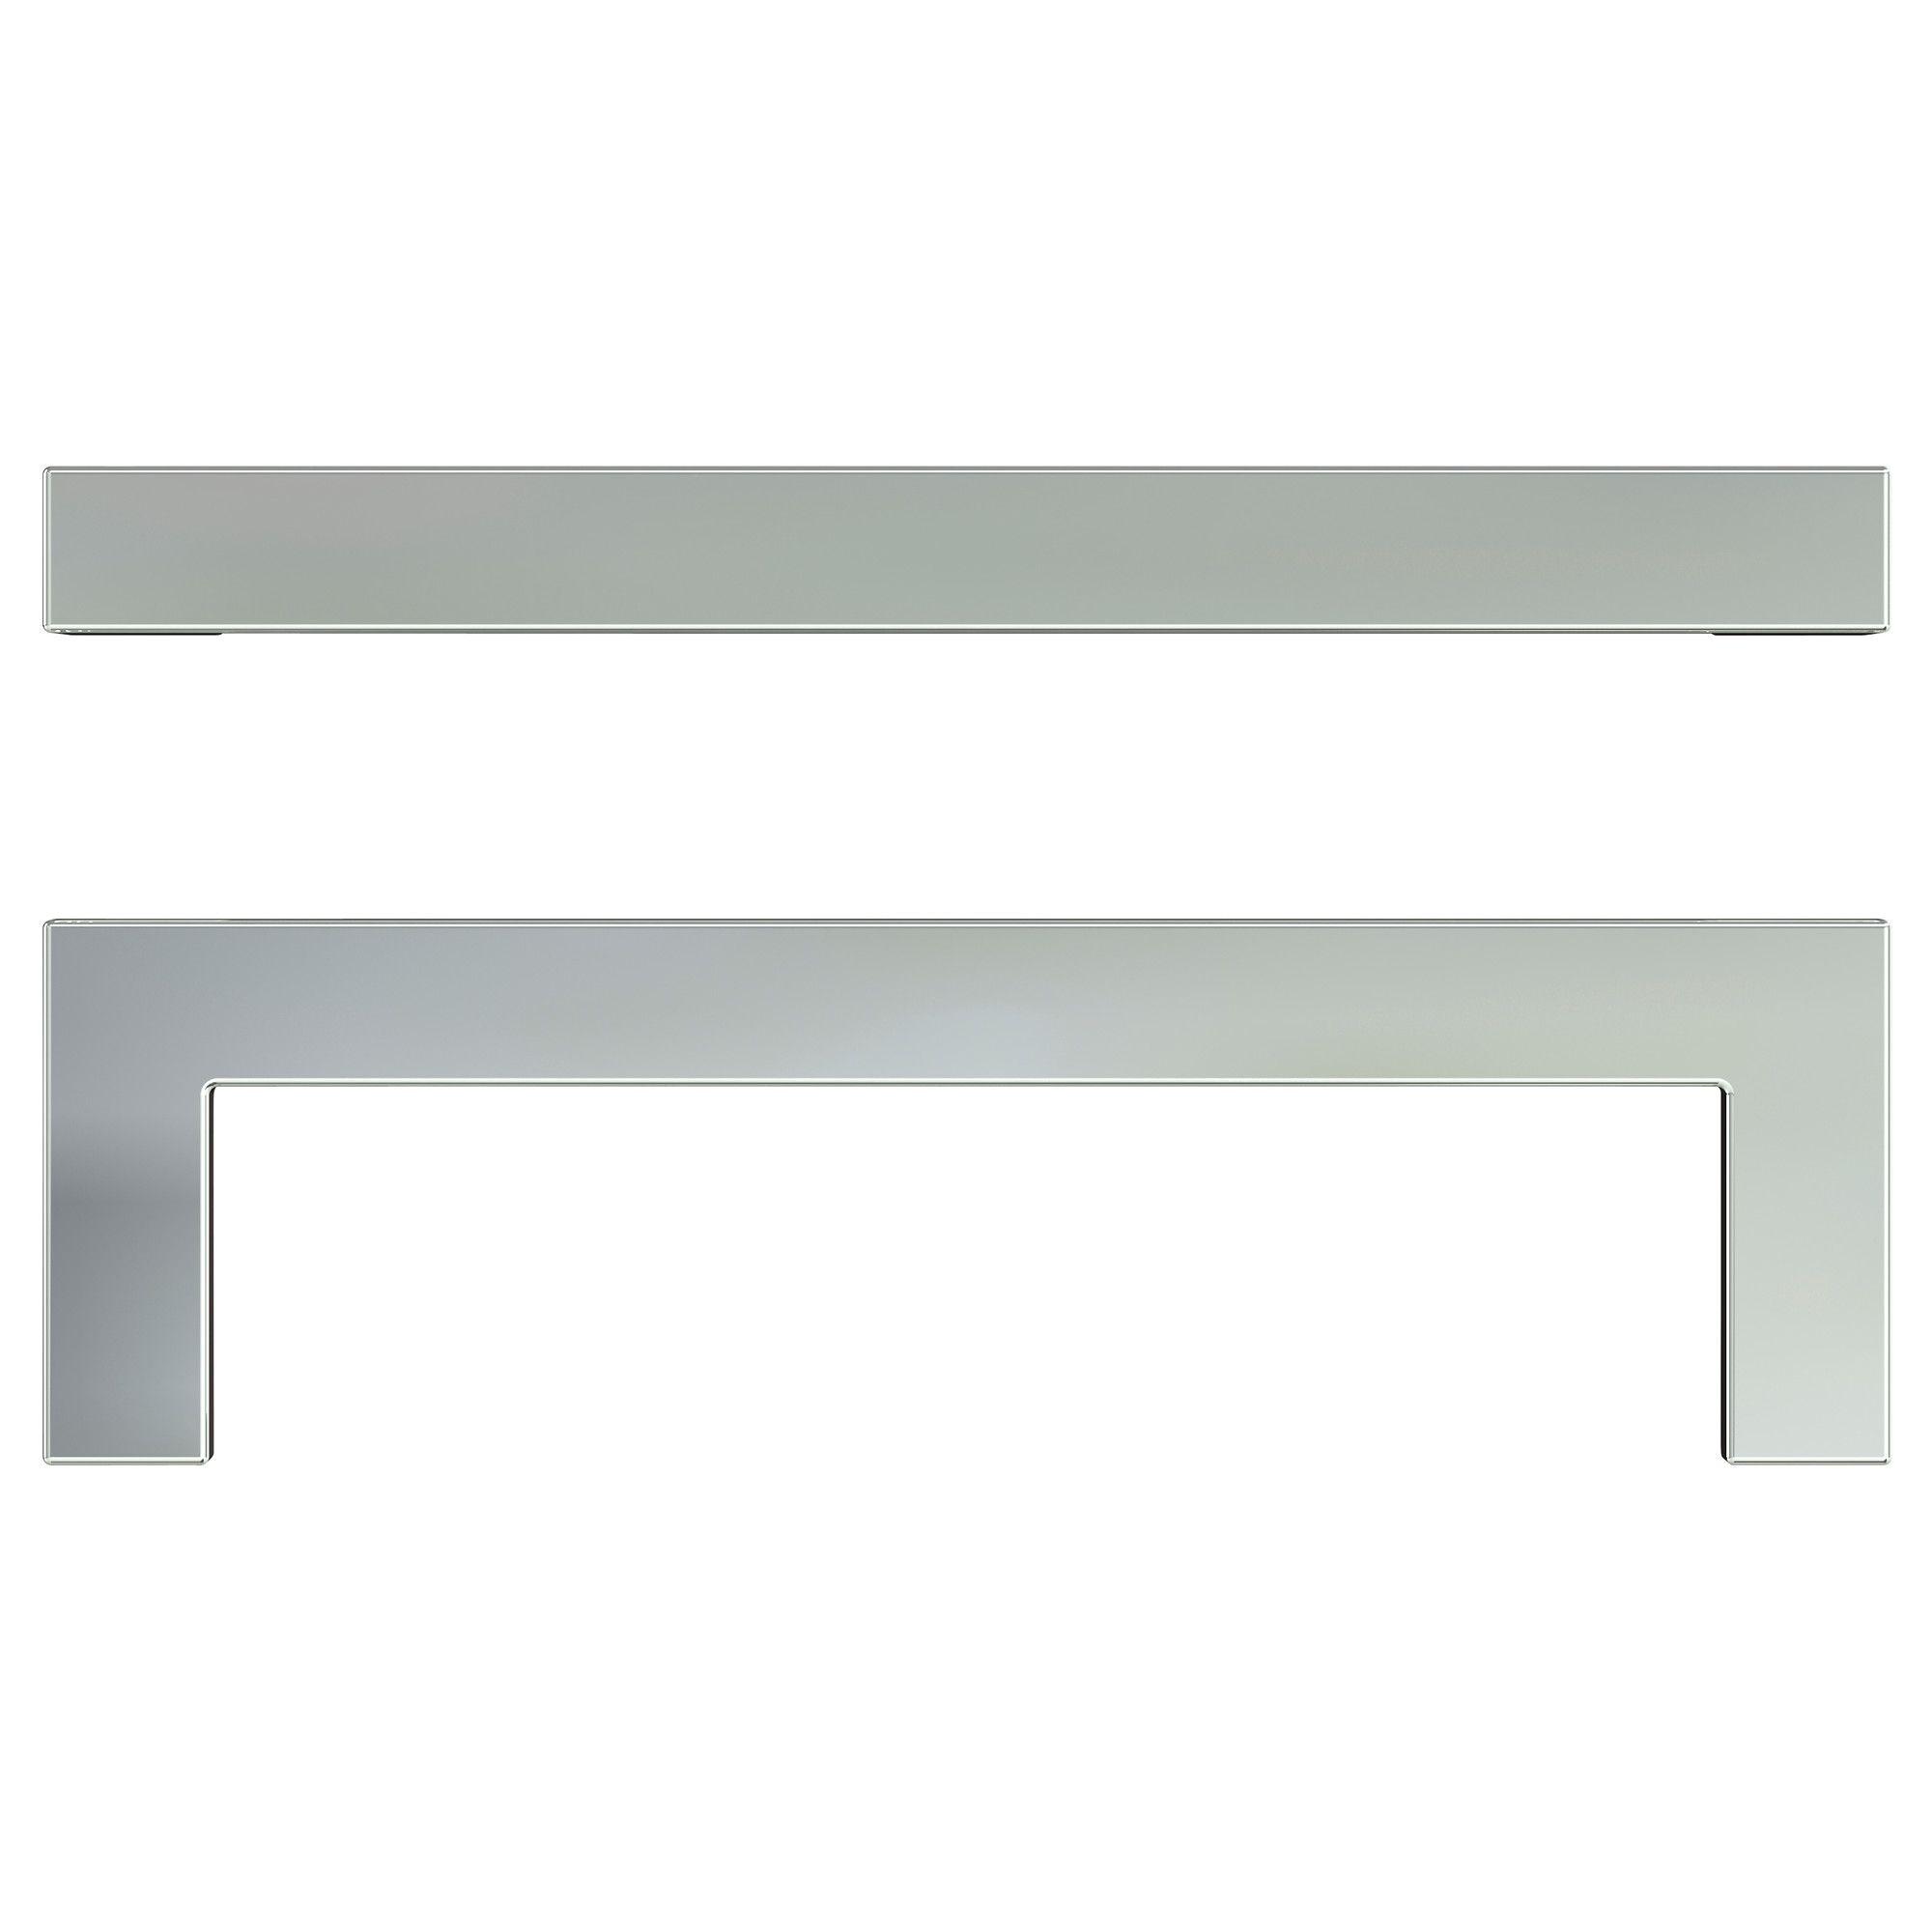 design door nice to ikea unique ideas com beautiful images of doors pertaining cabinet kitchen photos on drawer knobs pulls handles